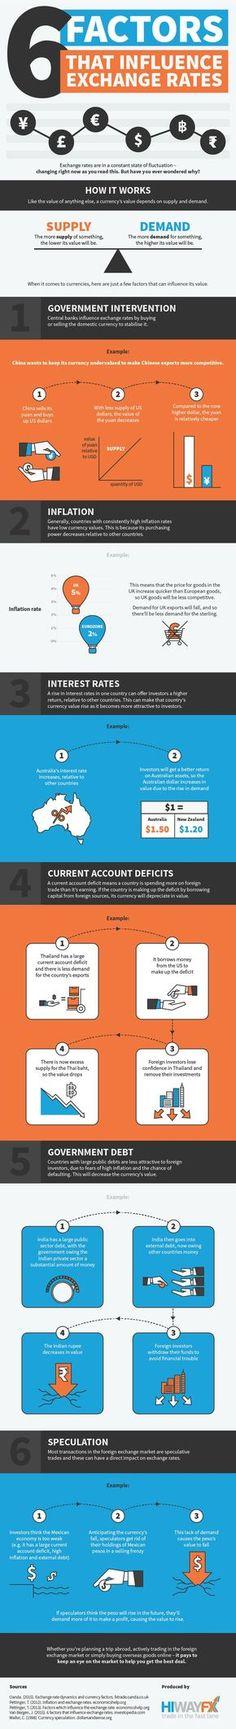 6 Factors that Influence Exchange Rates #infographic #Finance #Money #ExchangeRates